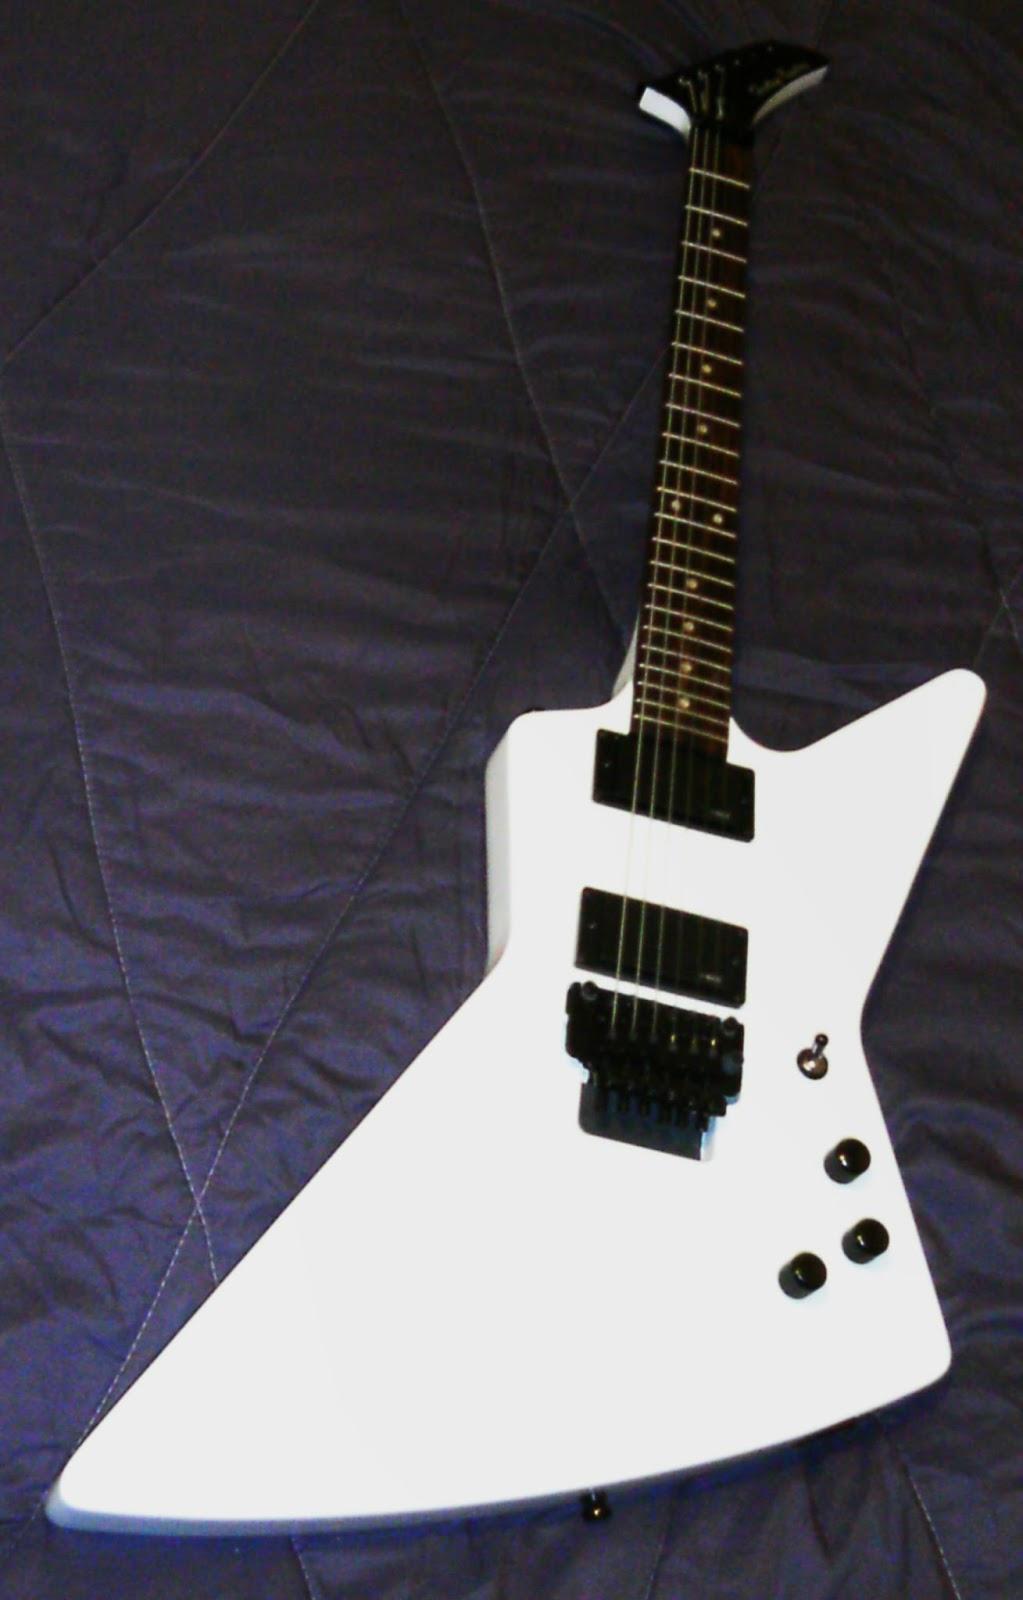 Harley Benton EX-84 FR | Guitar Dreamer